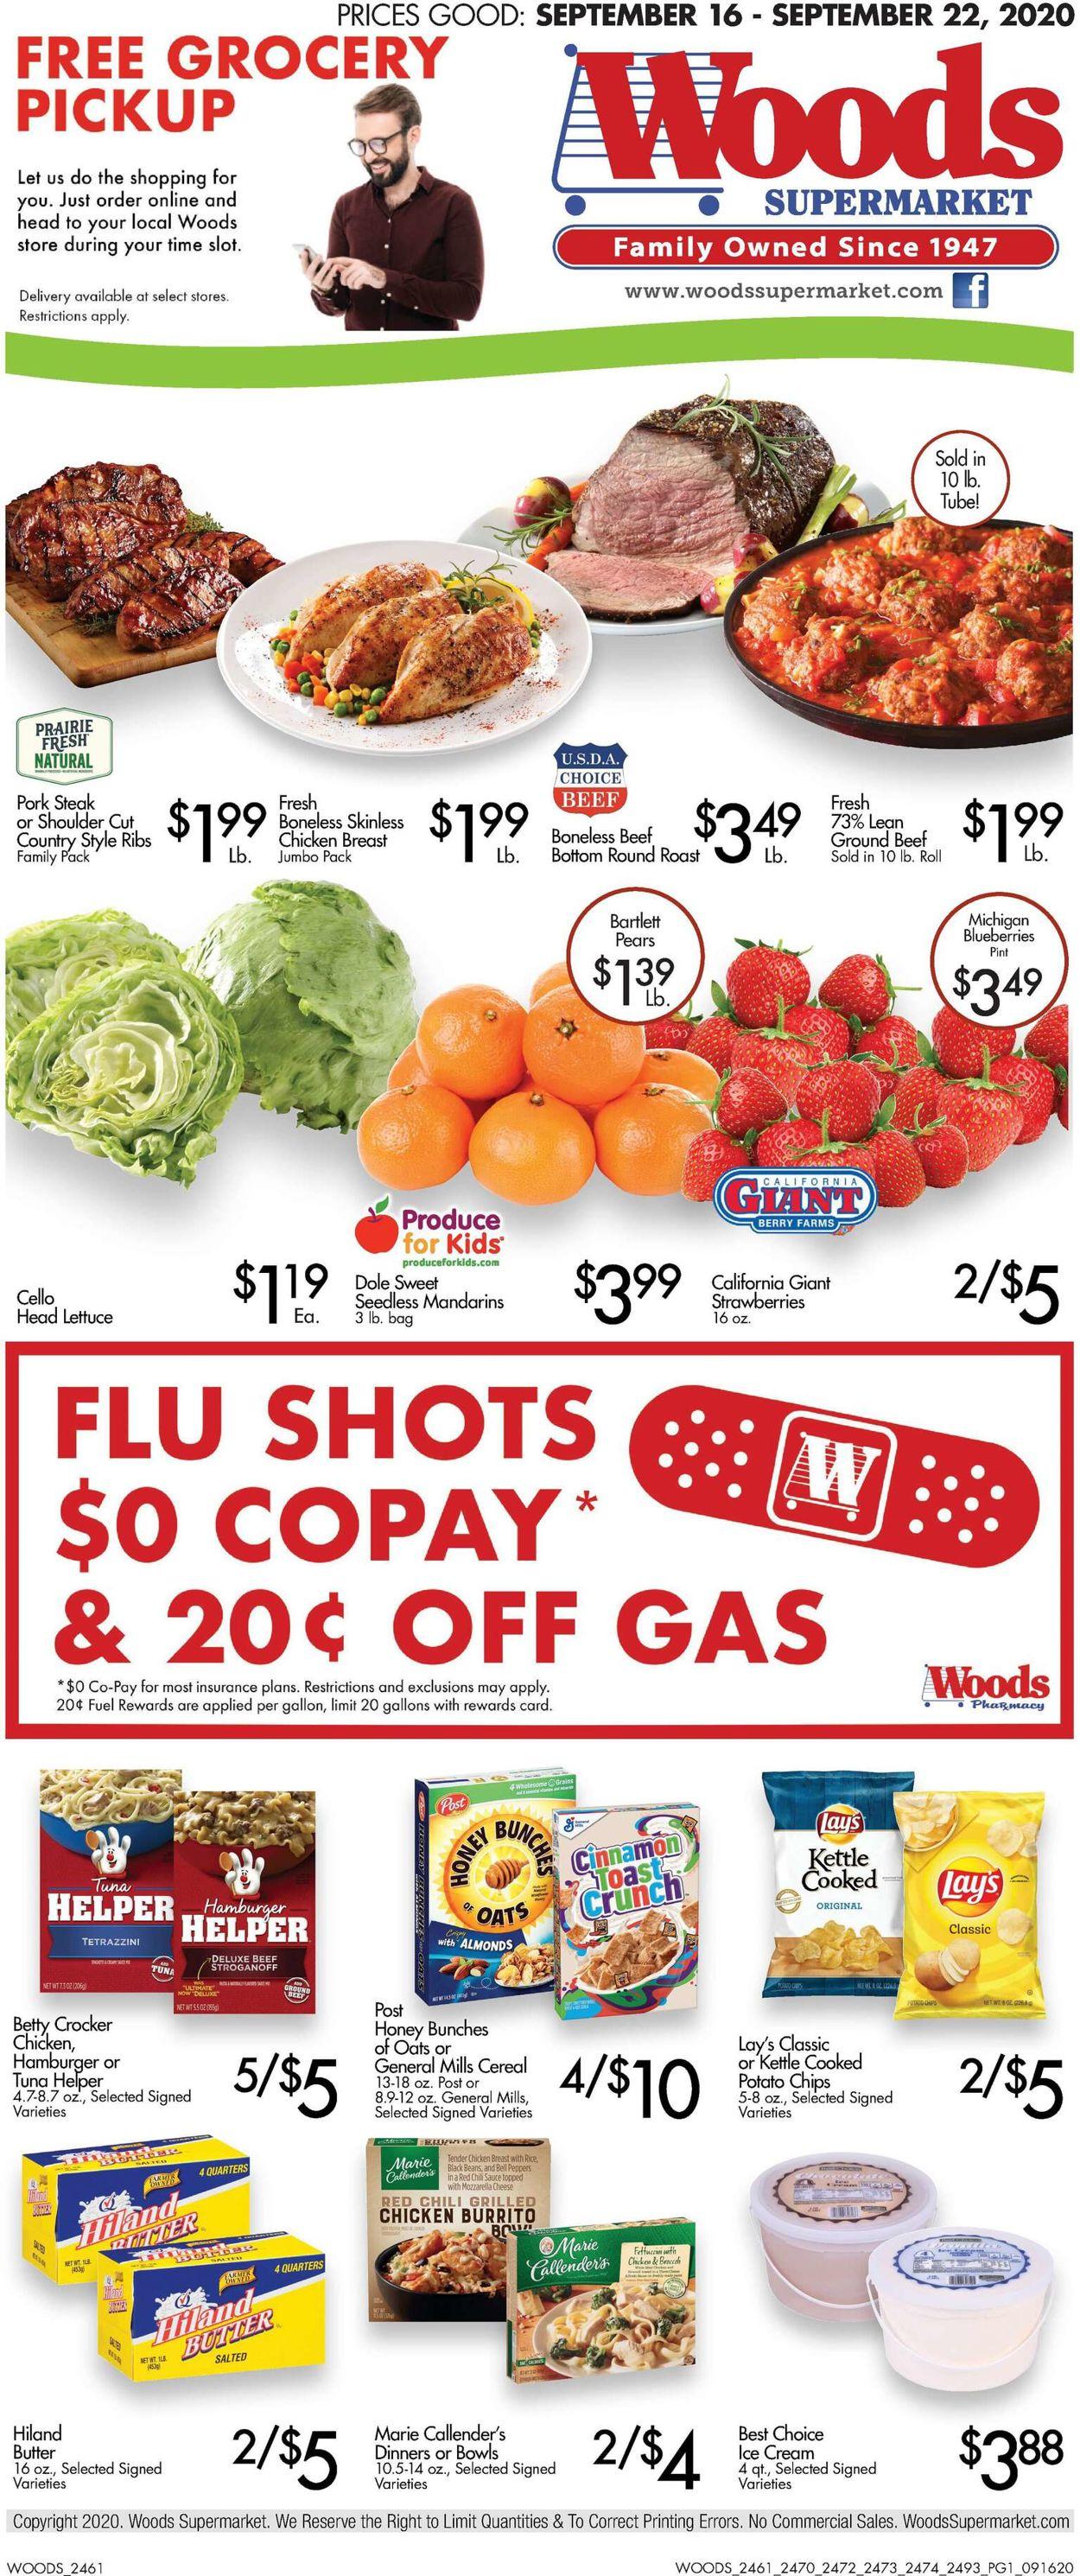 Woods Supermarket Weekly Ad Circular - valid 09/16-09/22/2020